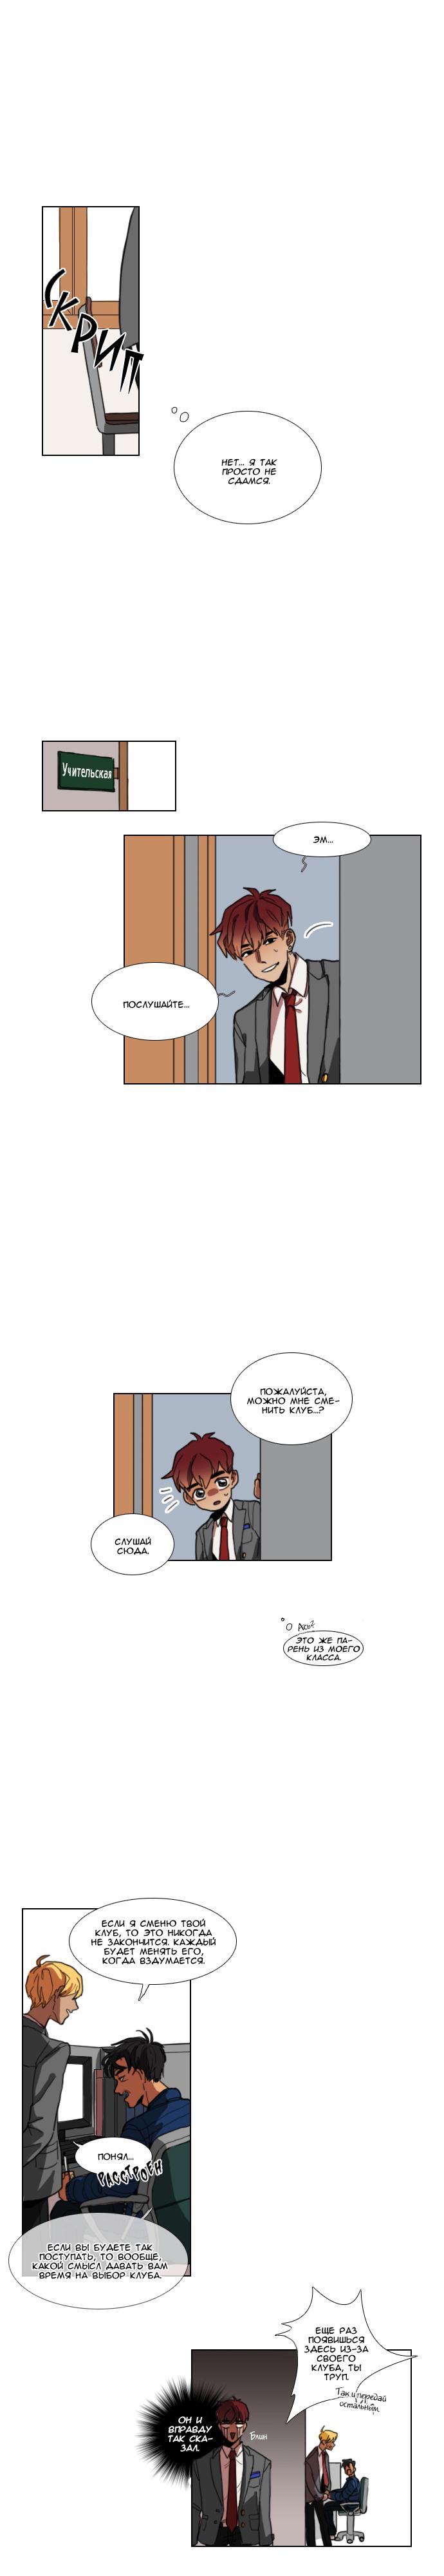 https://r1.ninemanga.com/comics/pic2/27/31131/325920/1496560537614.jpg Page 1